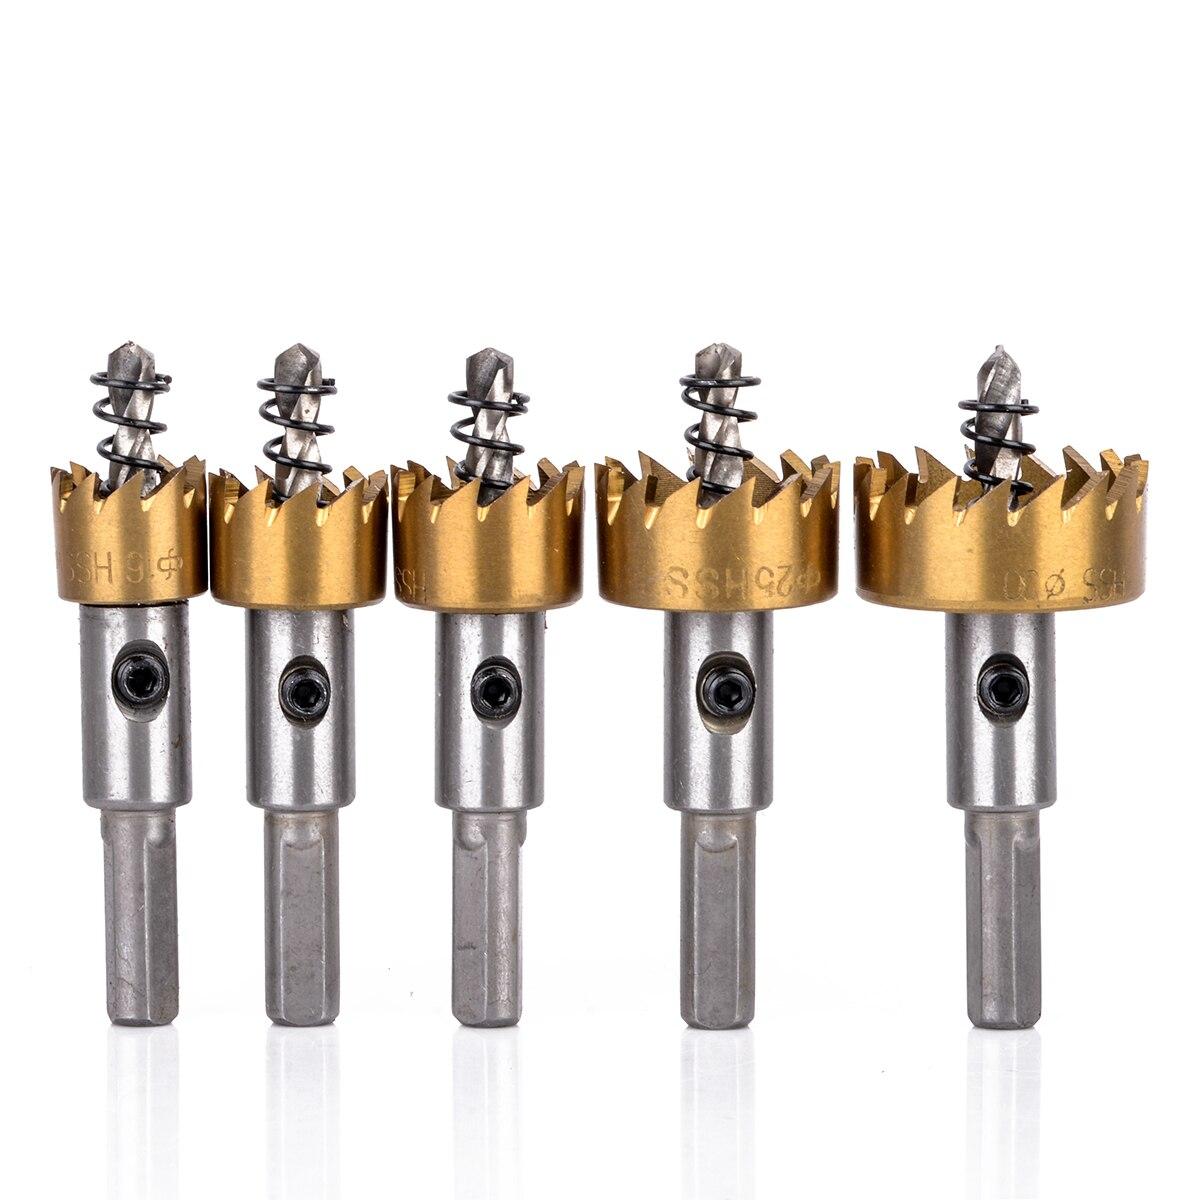 5Pcs HSS Drill Bit Hole Saw Set Stainless Steel Metal Alloy Cutter Power Tool 16/18.5//20/25/30mm